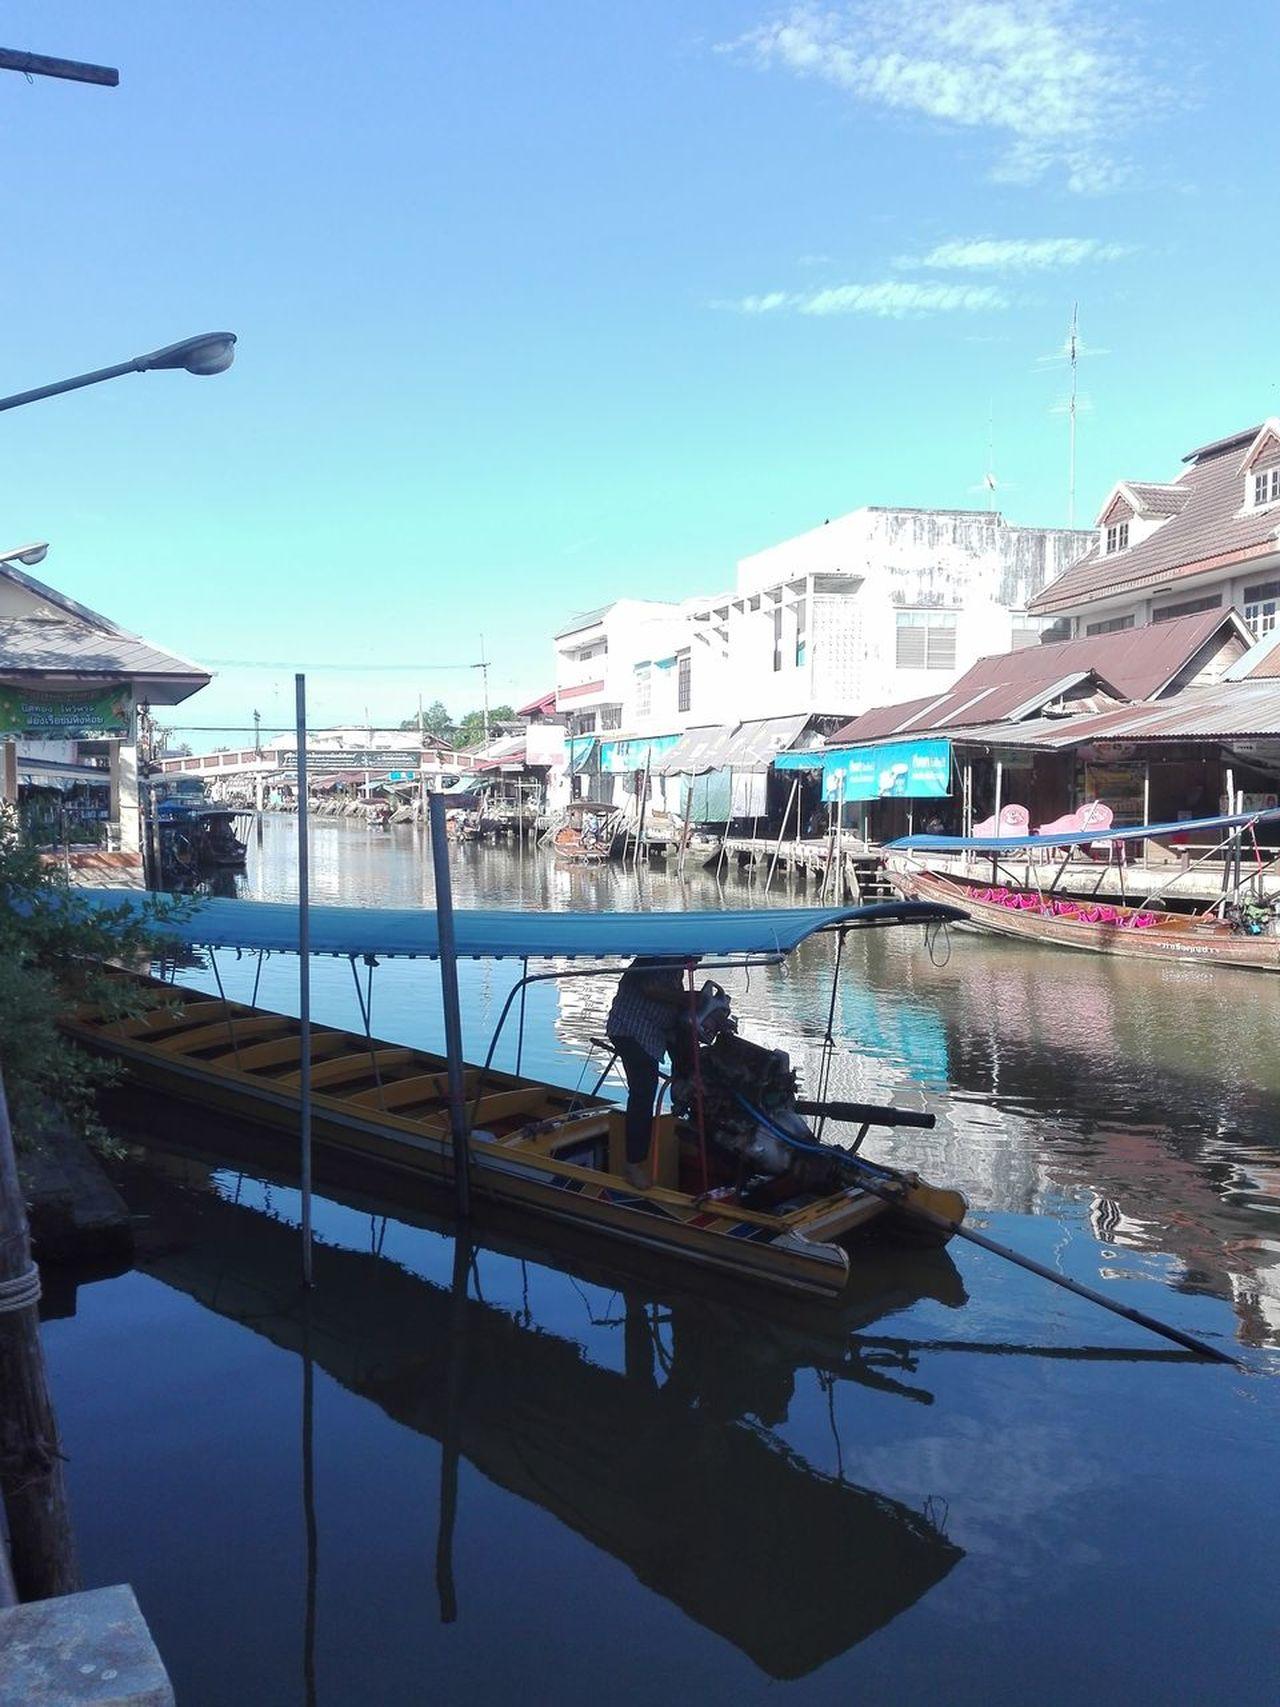 Boats River Makhong River Eyeemphoto EyeEm EyeEm Gallery